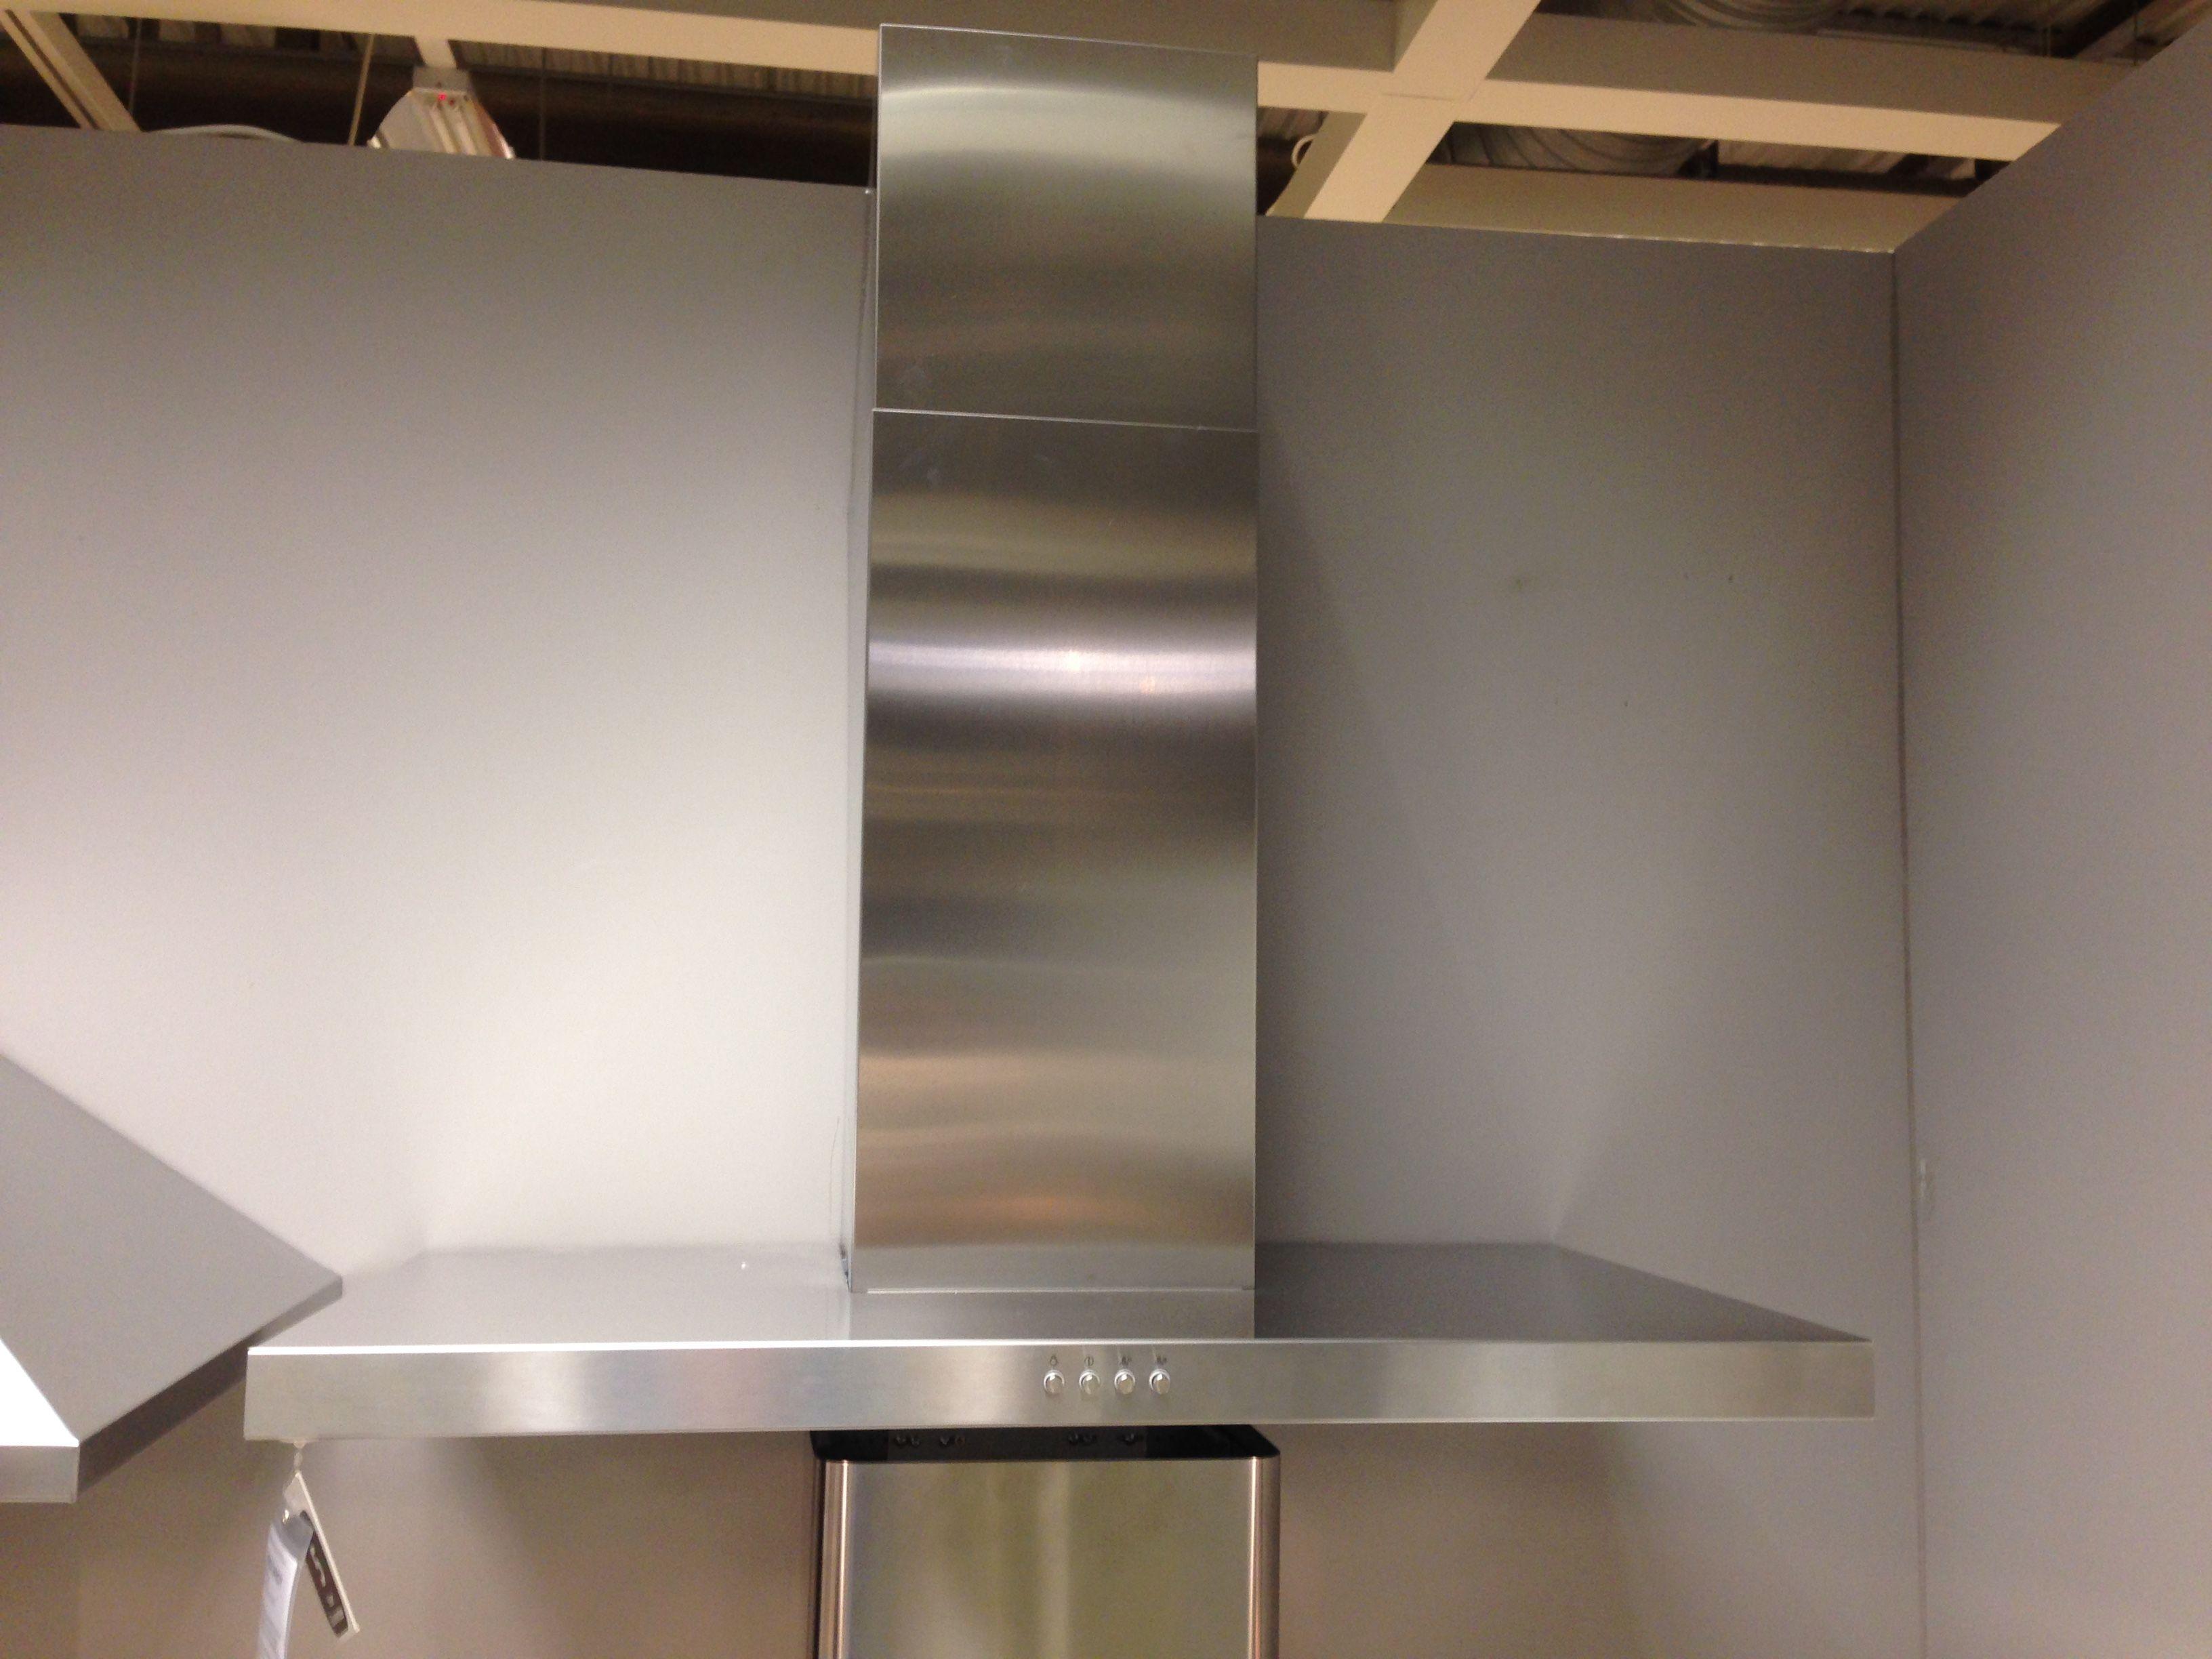 Molnigt extractor hood ikea 150 kitchen pinterest for Ikea kitchen hood